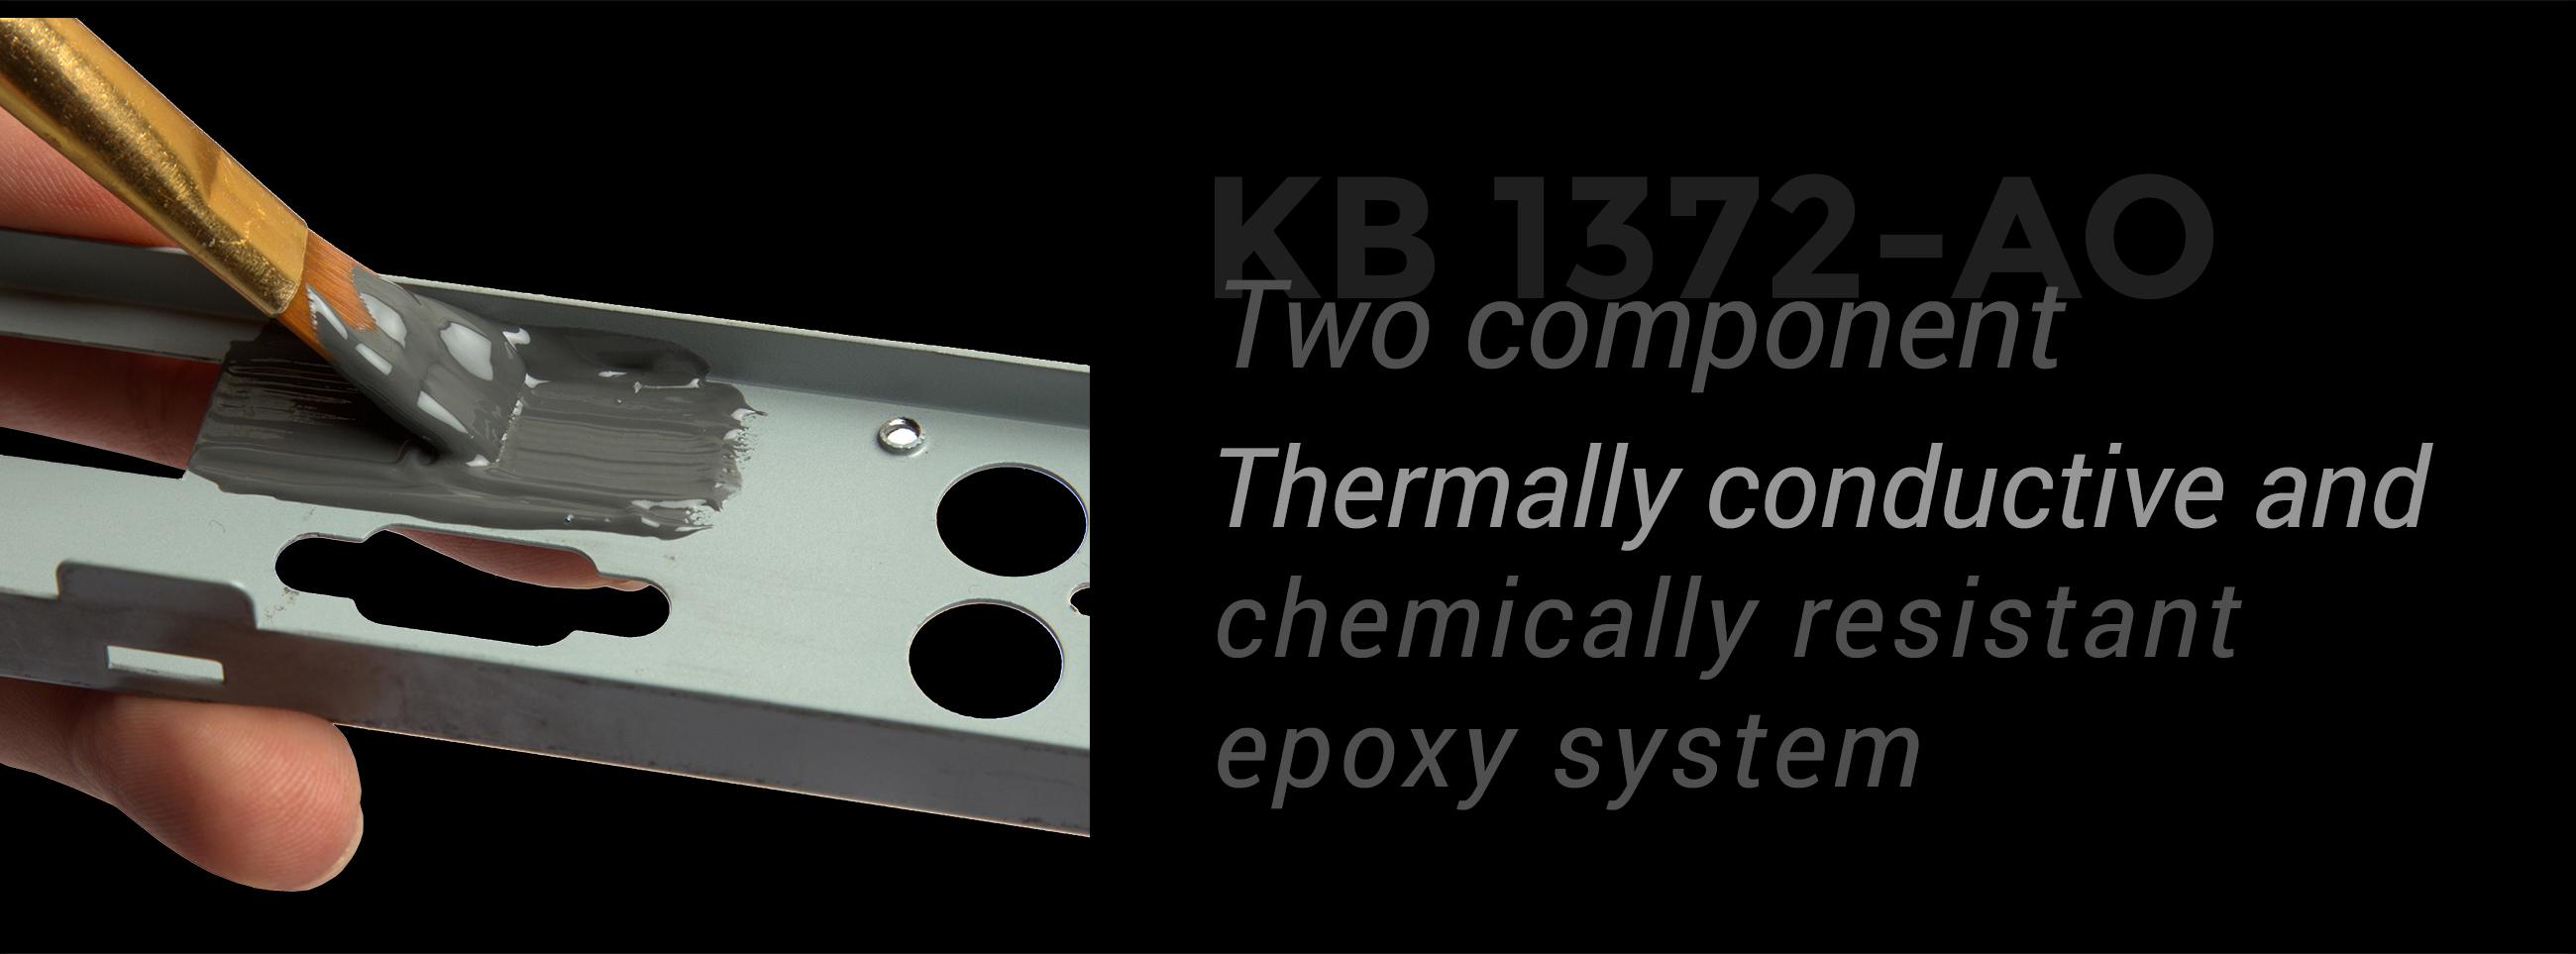 KB 1372-AO